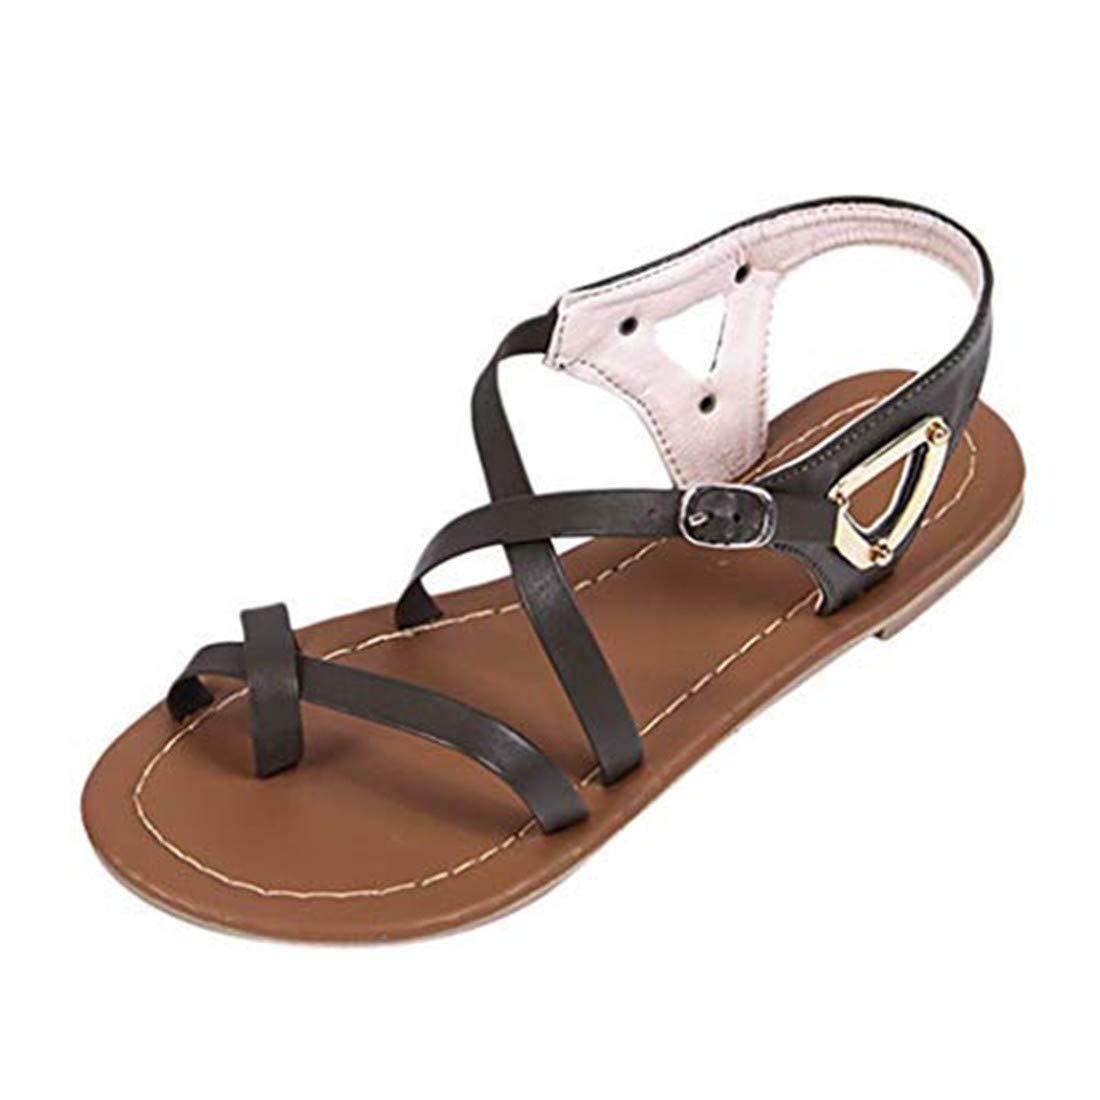 Flat Buckle Sandals for Women - POHOK Women Ladies Summer Casual Big Size Flat Beach Sandals Roman Shoes (Army Green,35)